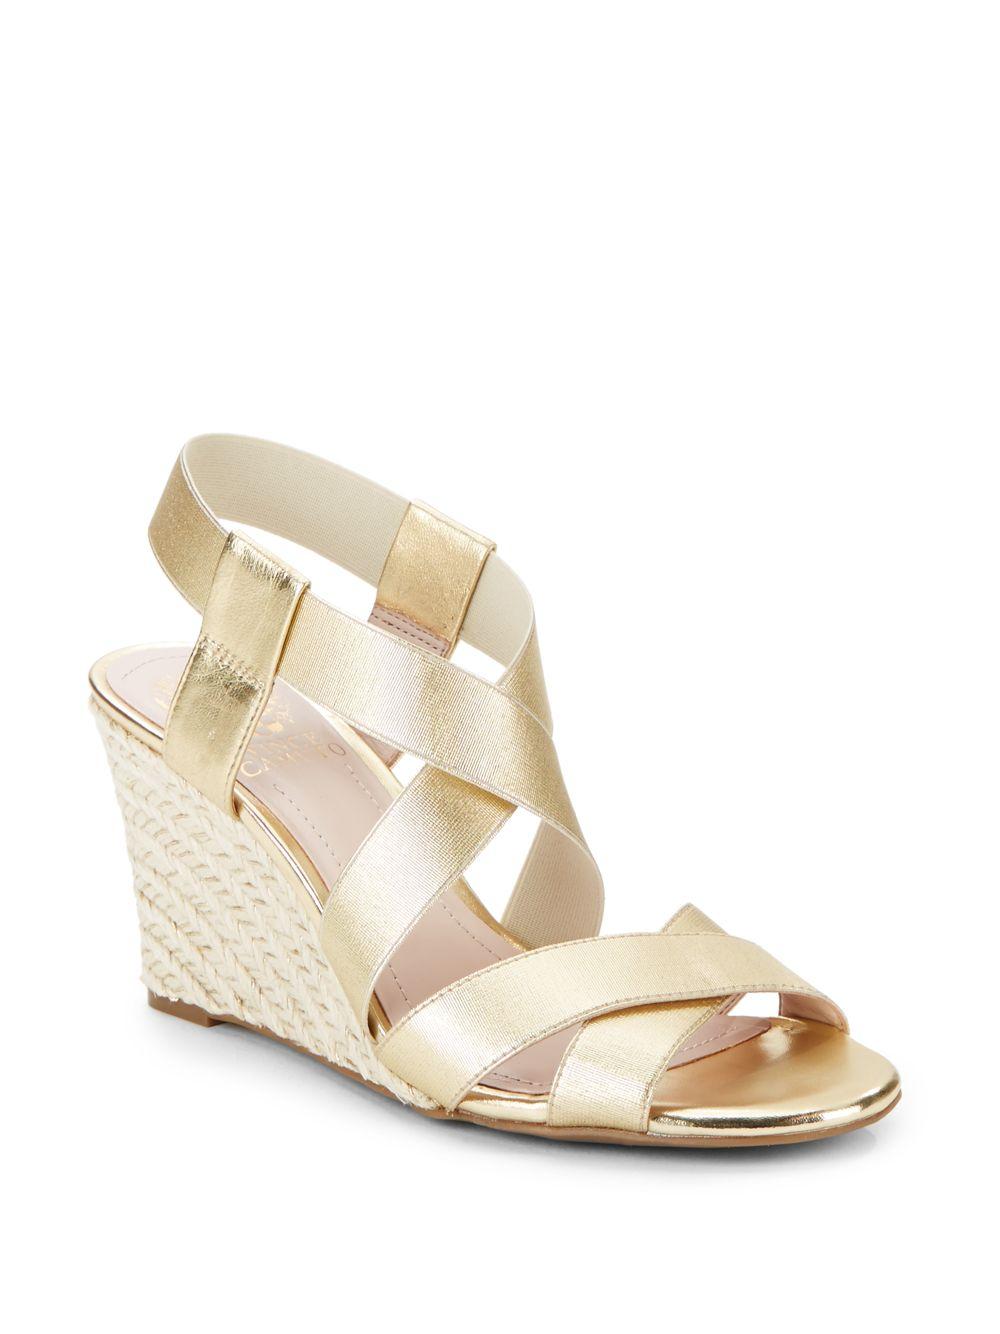 Vince Camuto Hadassa Metallic Wedge Sandals Gold In